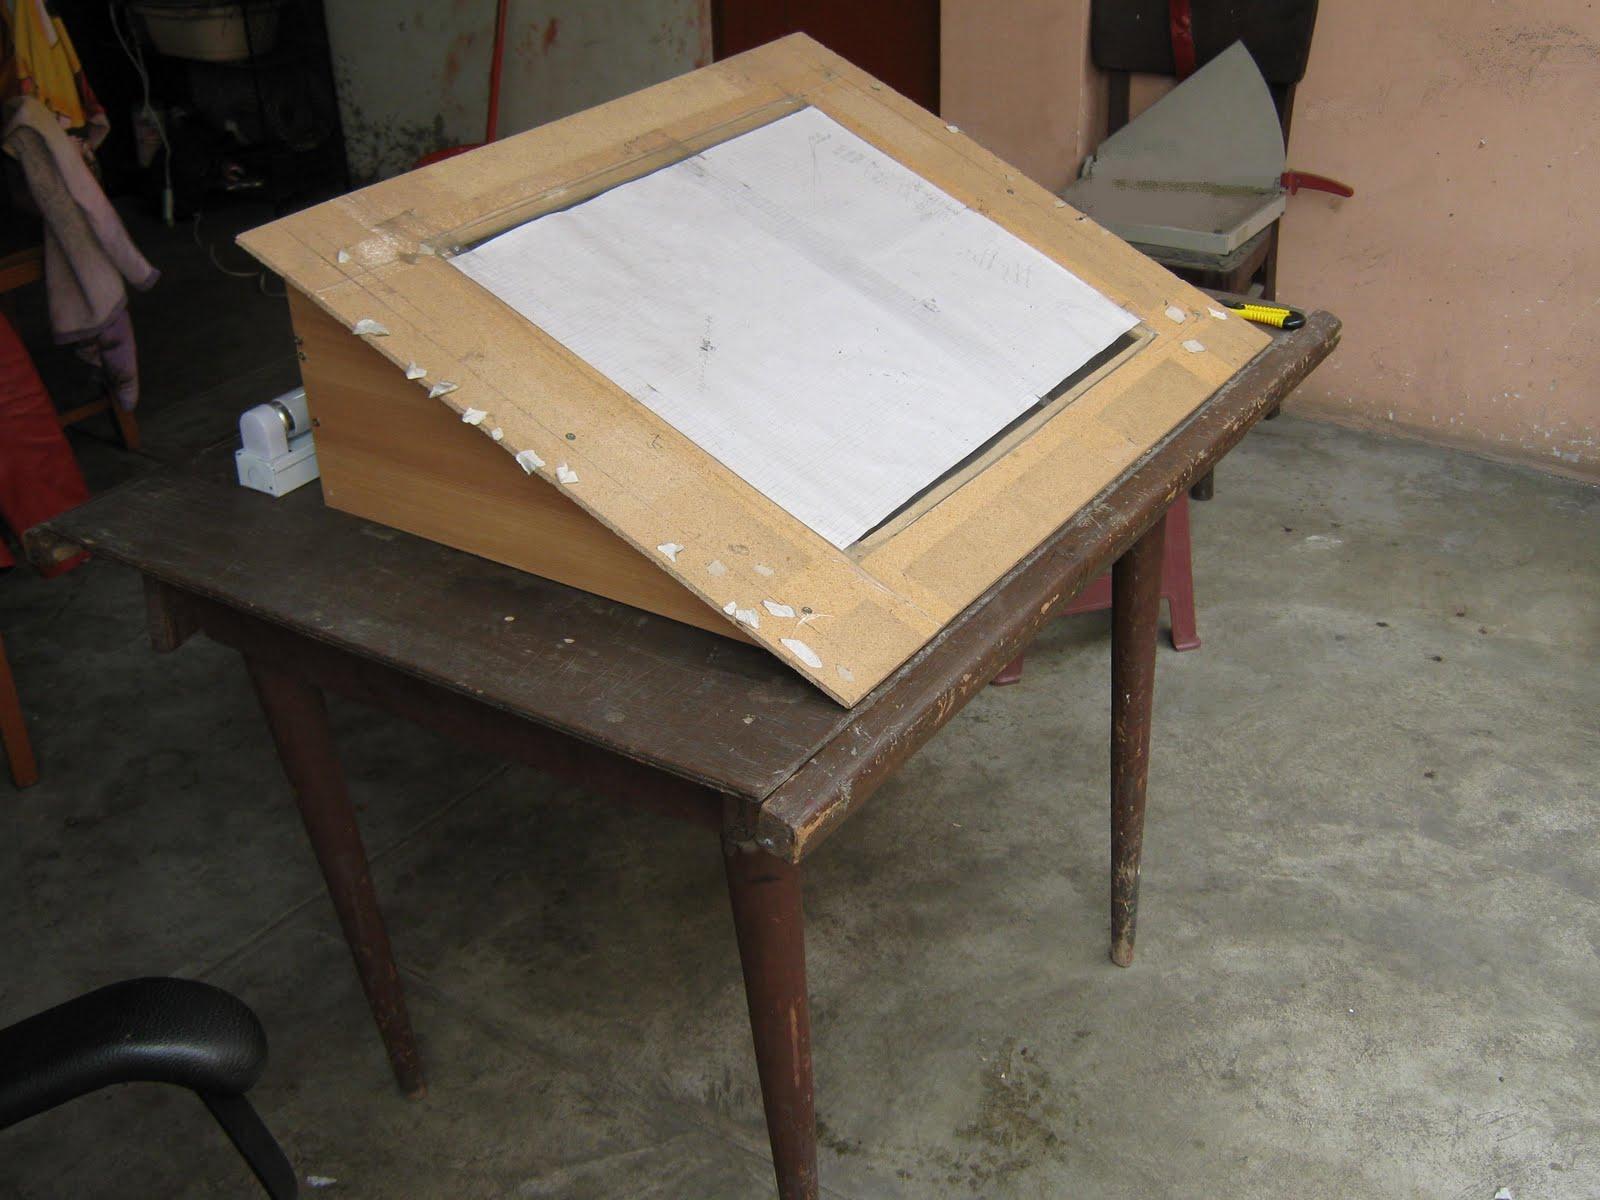 El taller de boshek como hacer tu mesa de calcar 1 - Mesa de calcar ikea ...